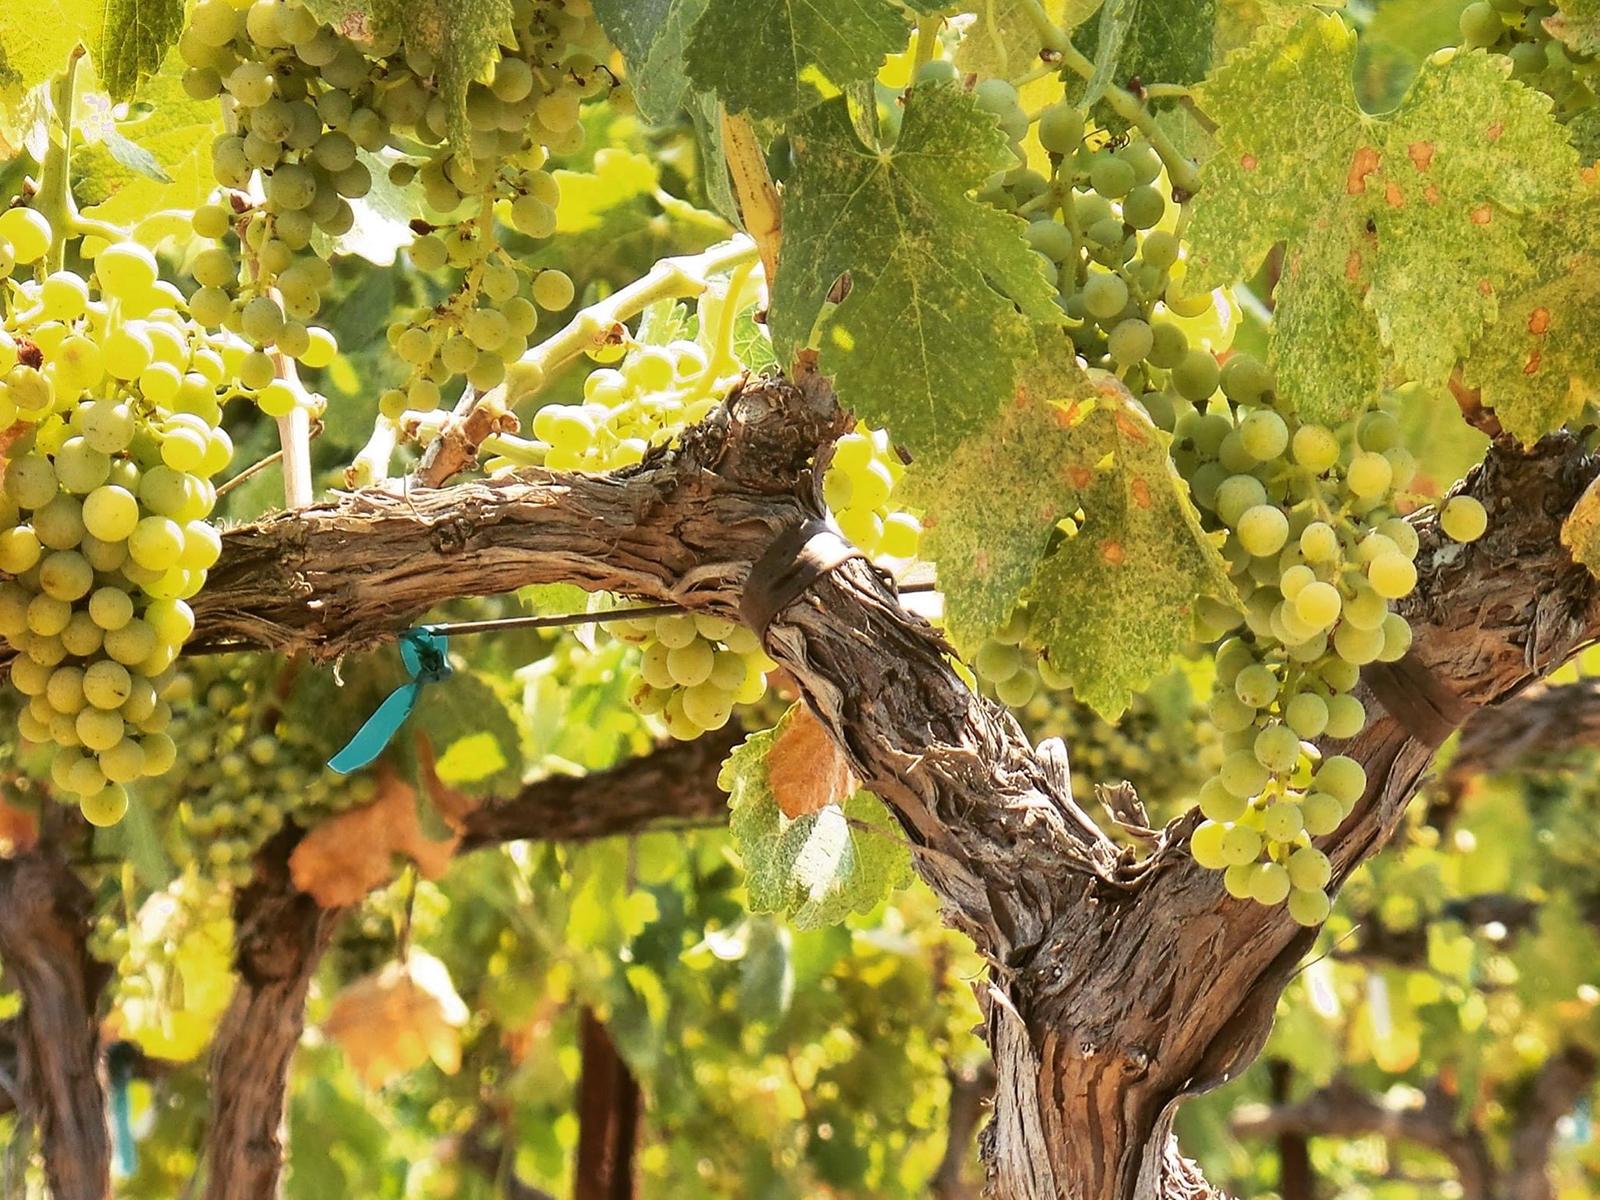 Viognier grapes on the vine